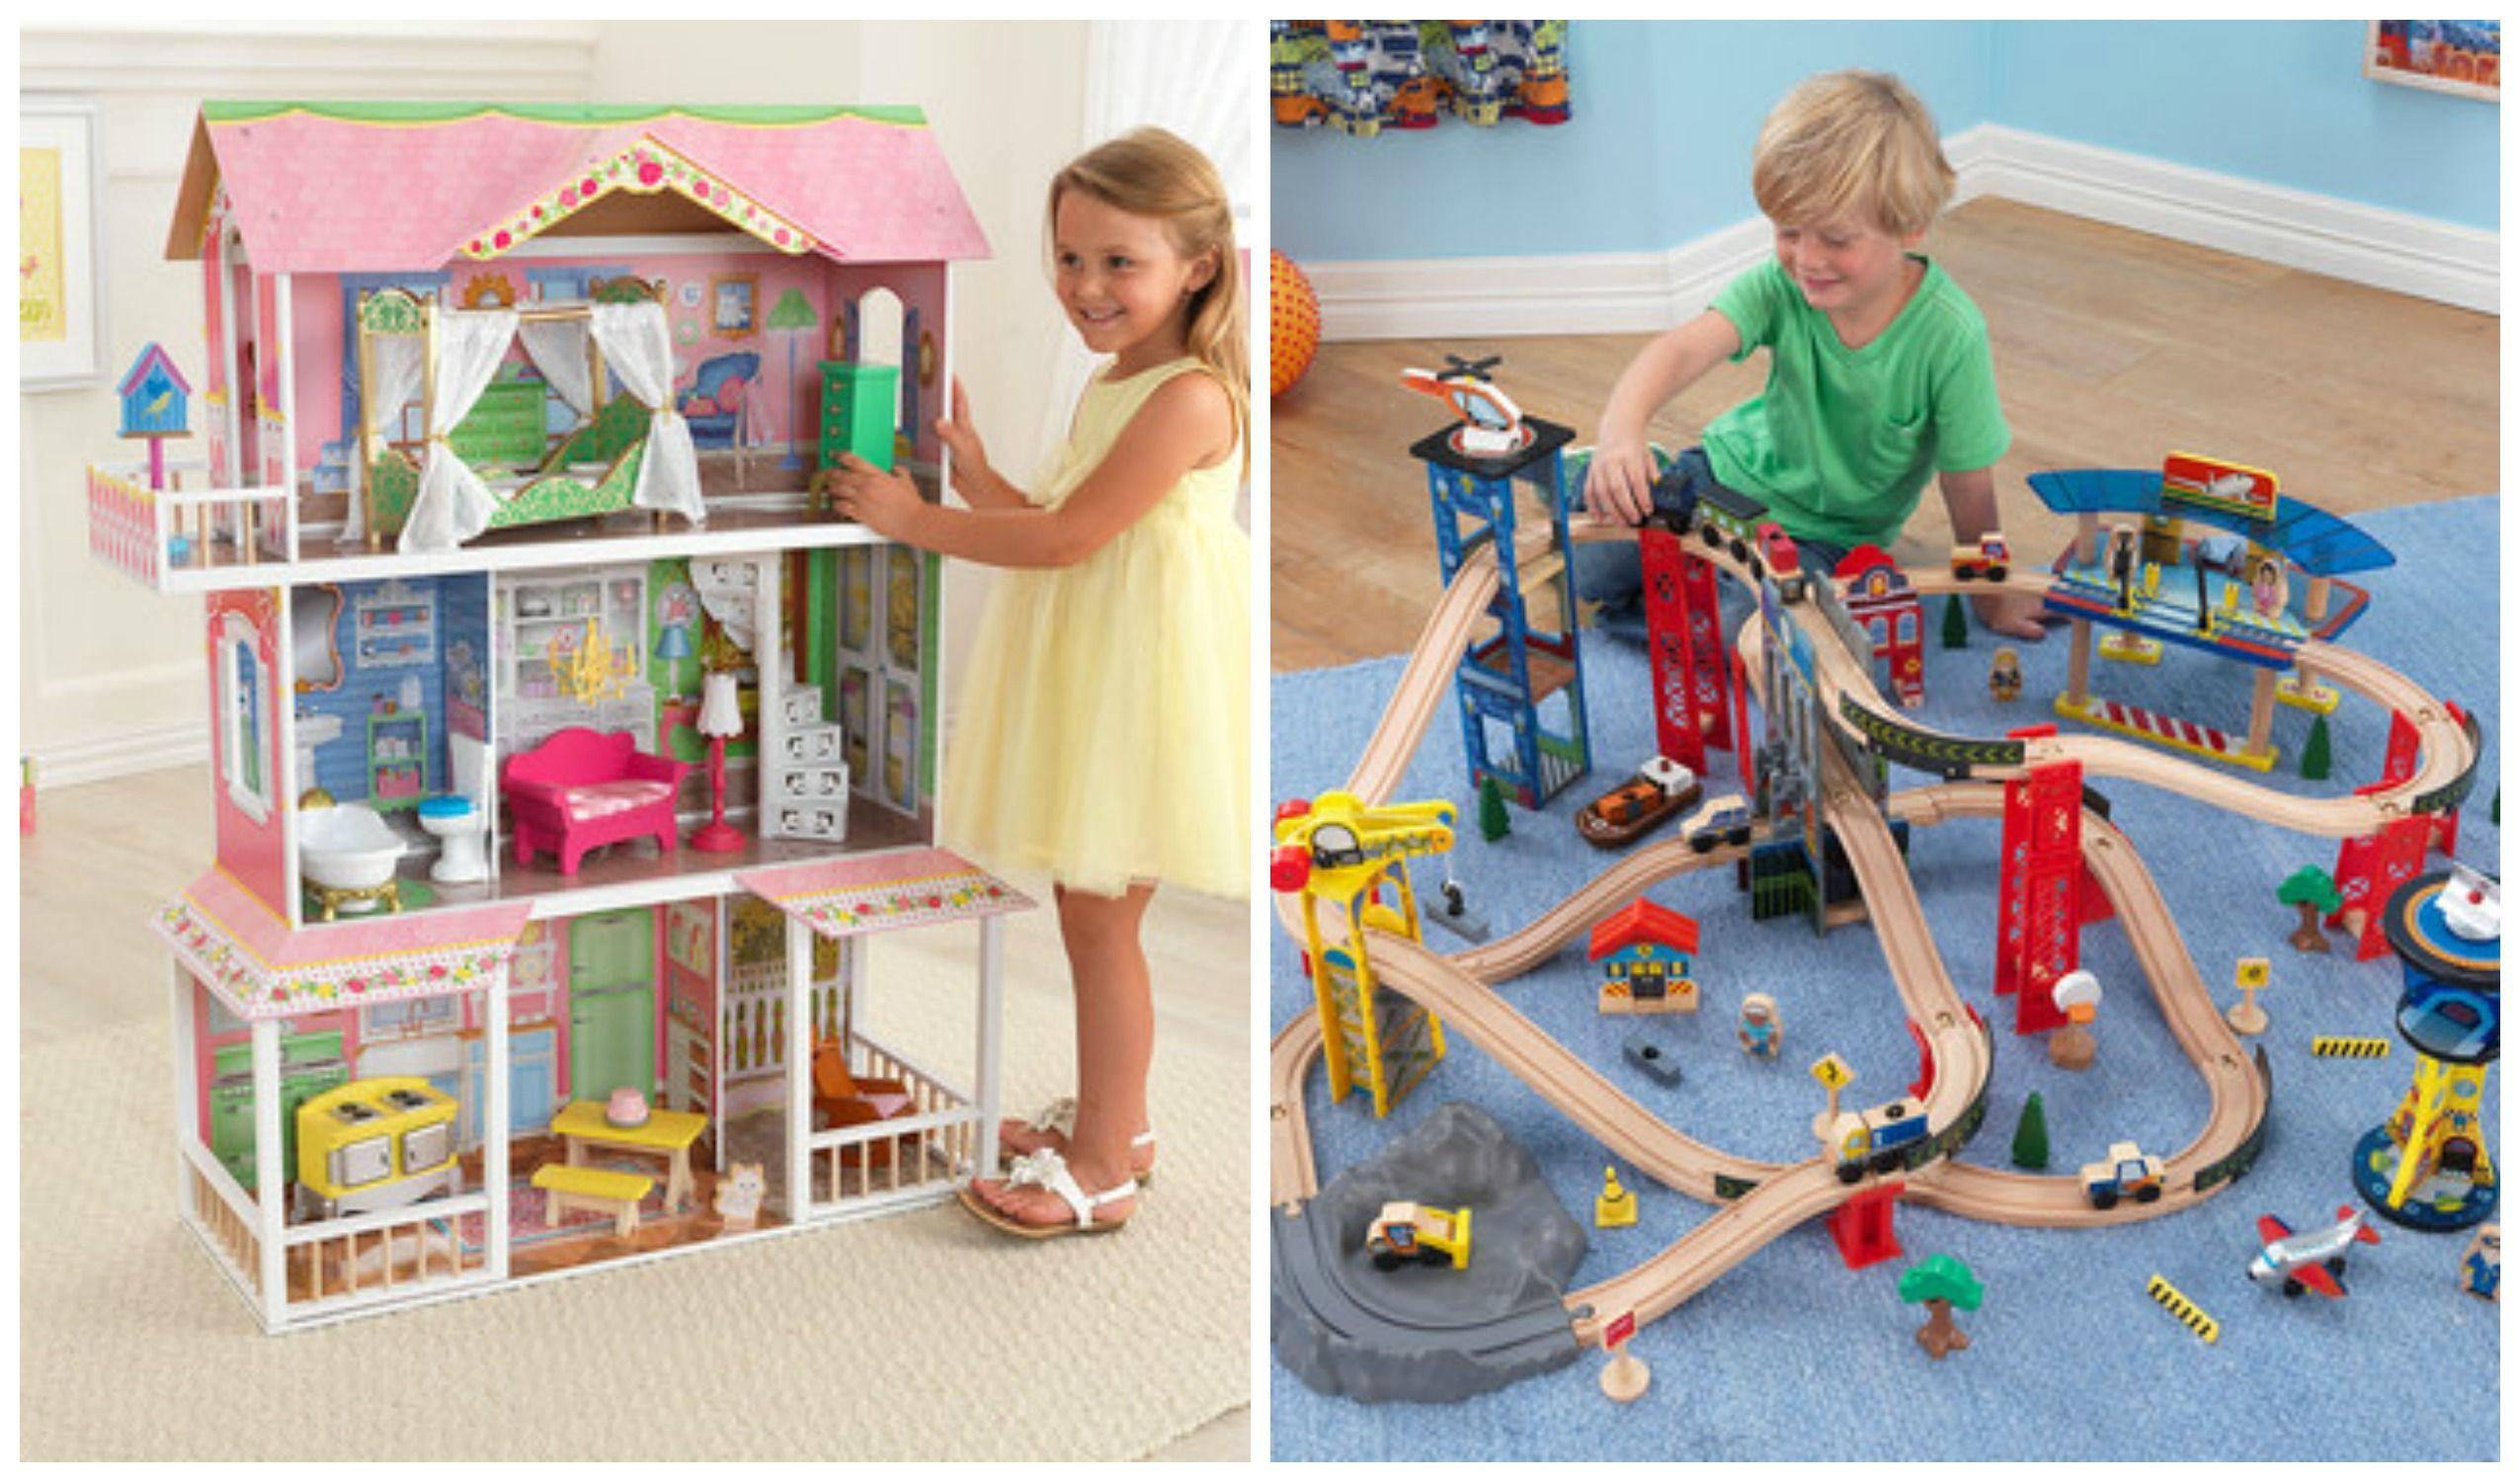 KidKraft Train & Dollhouse Sale – Up to 45% Off!